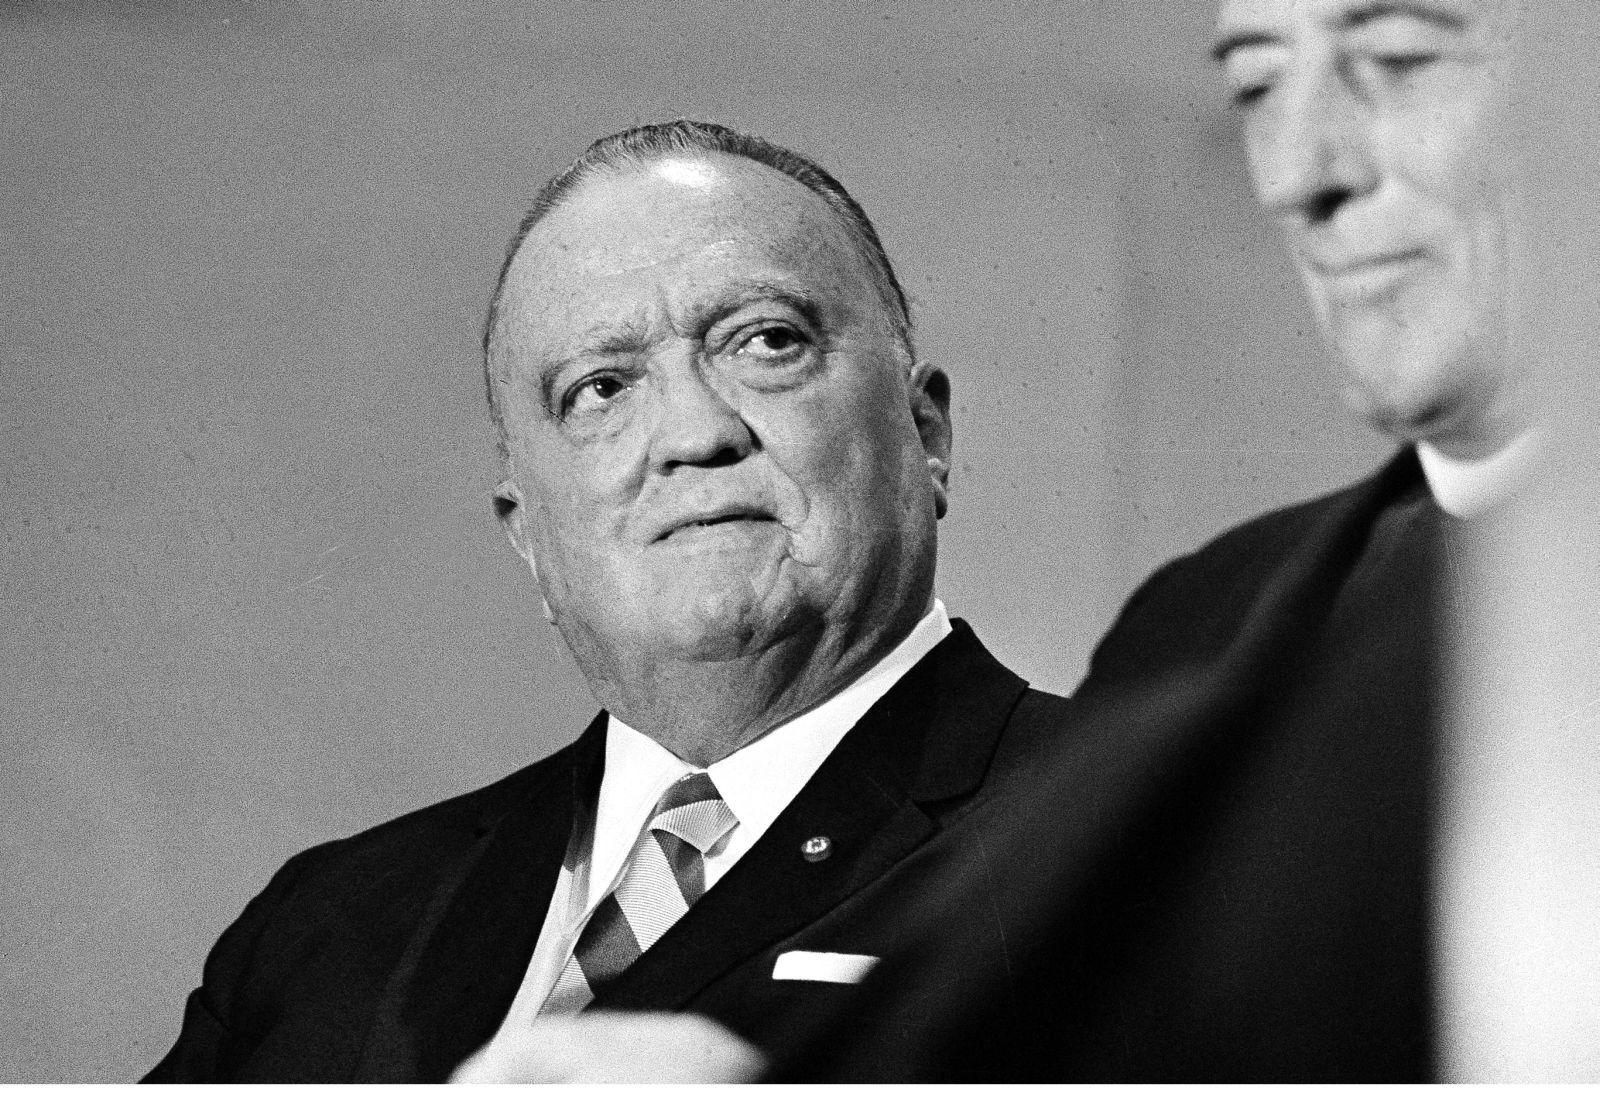 Otto von Bolschwing spolupracoval s USA jako antisovětský špion. A E. J. Hoover